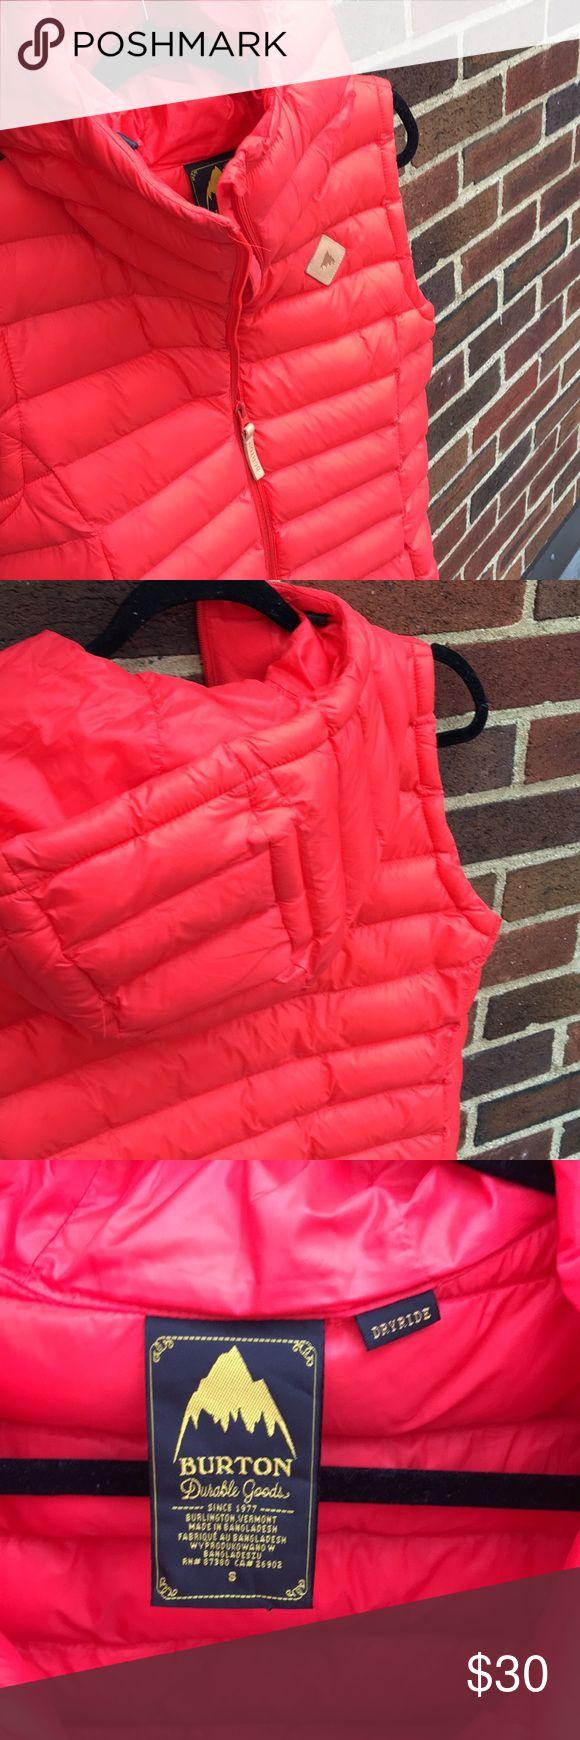 Burton orange ski vest Burton durable goods orange ski vest in great condition size small. Burton Jackets & Coats Vests